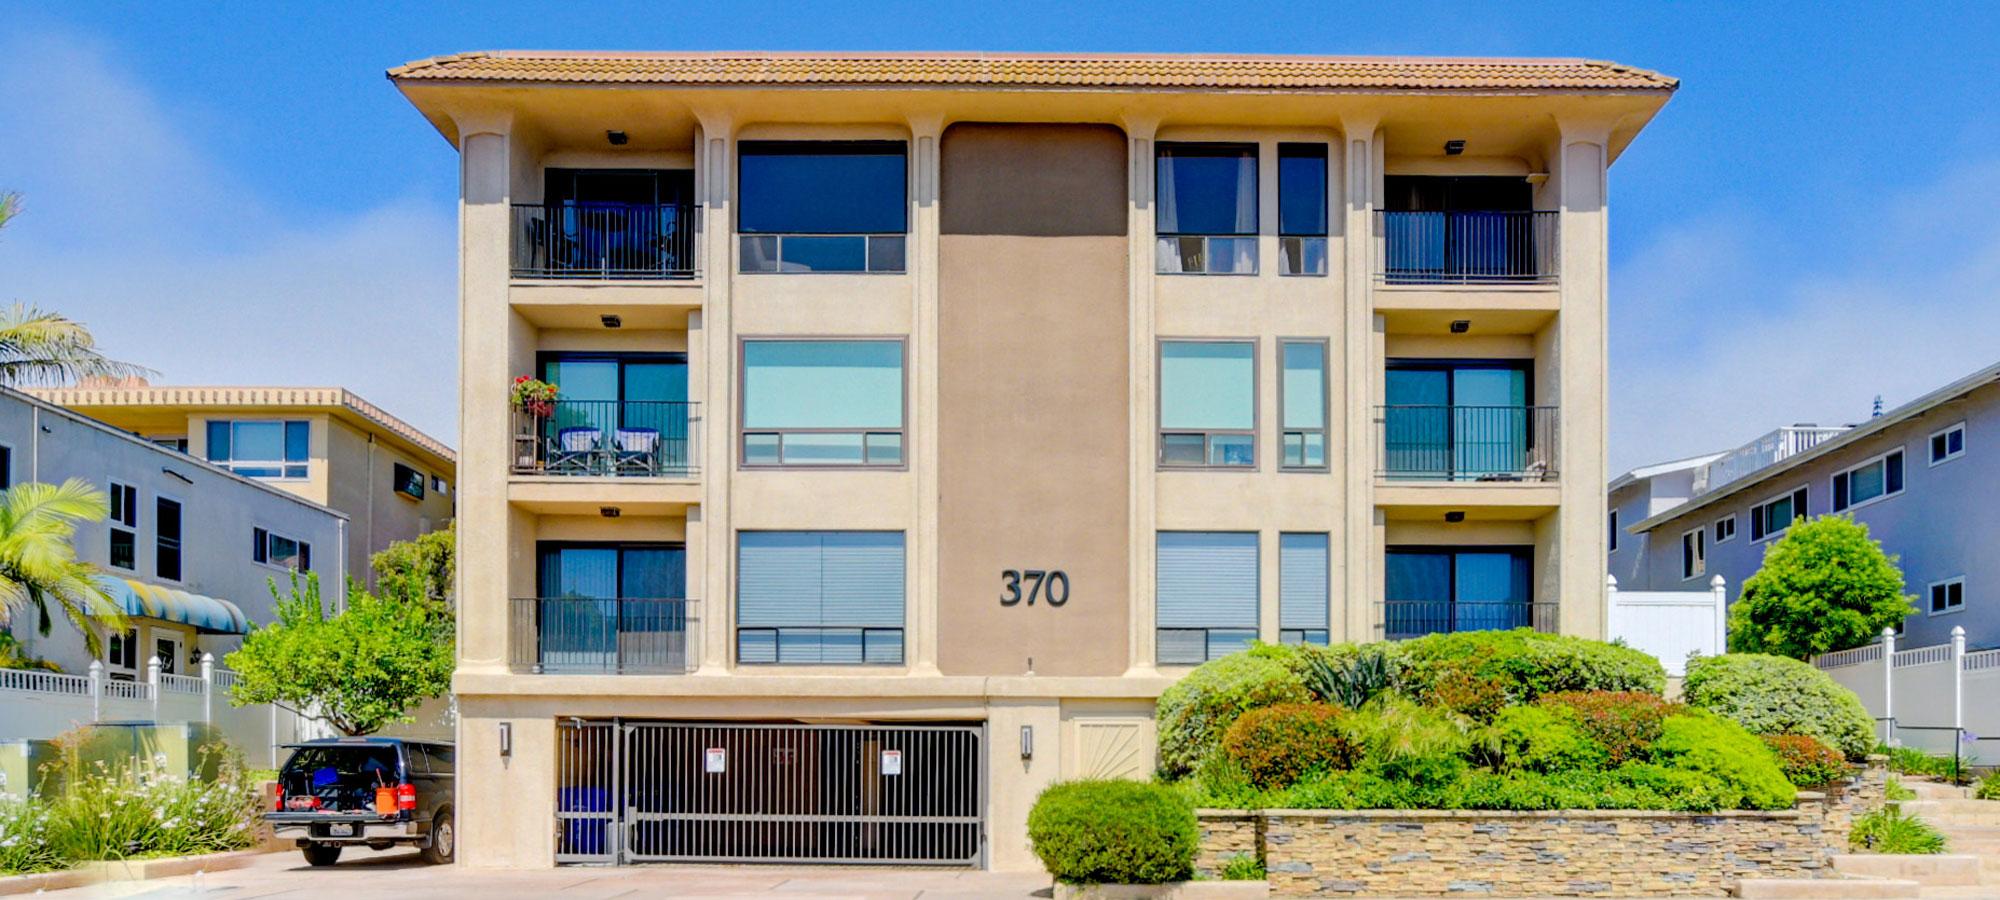 370 Rosecrans St APT 204 San Diego, CA 92106